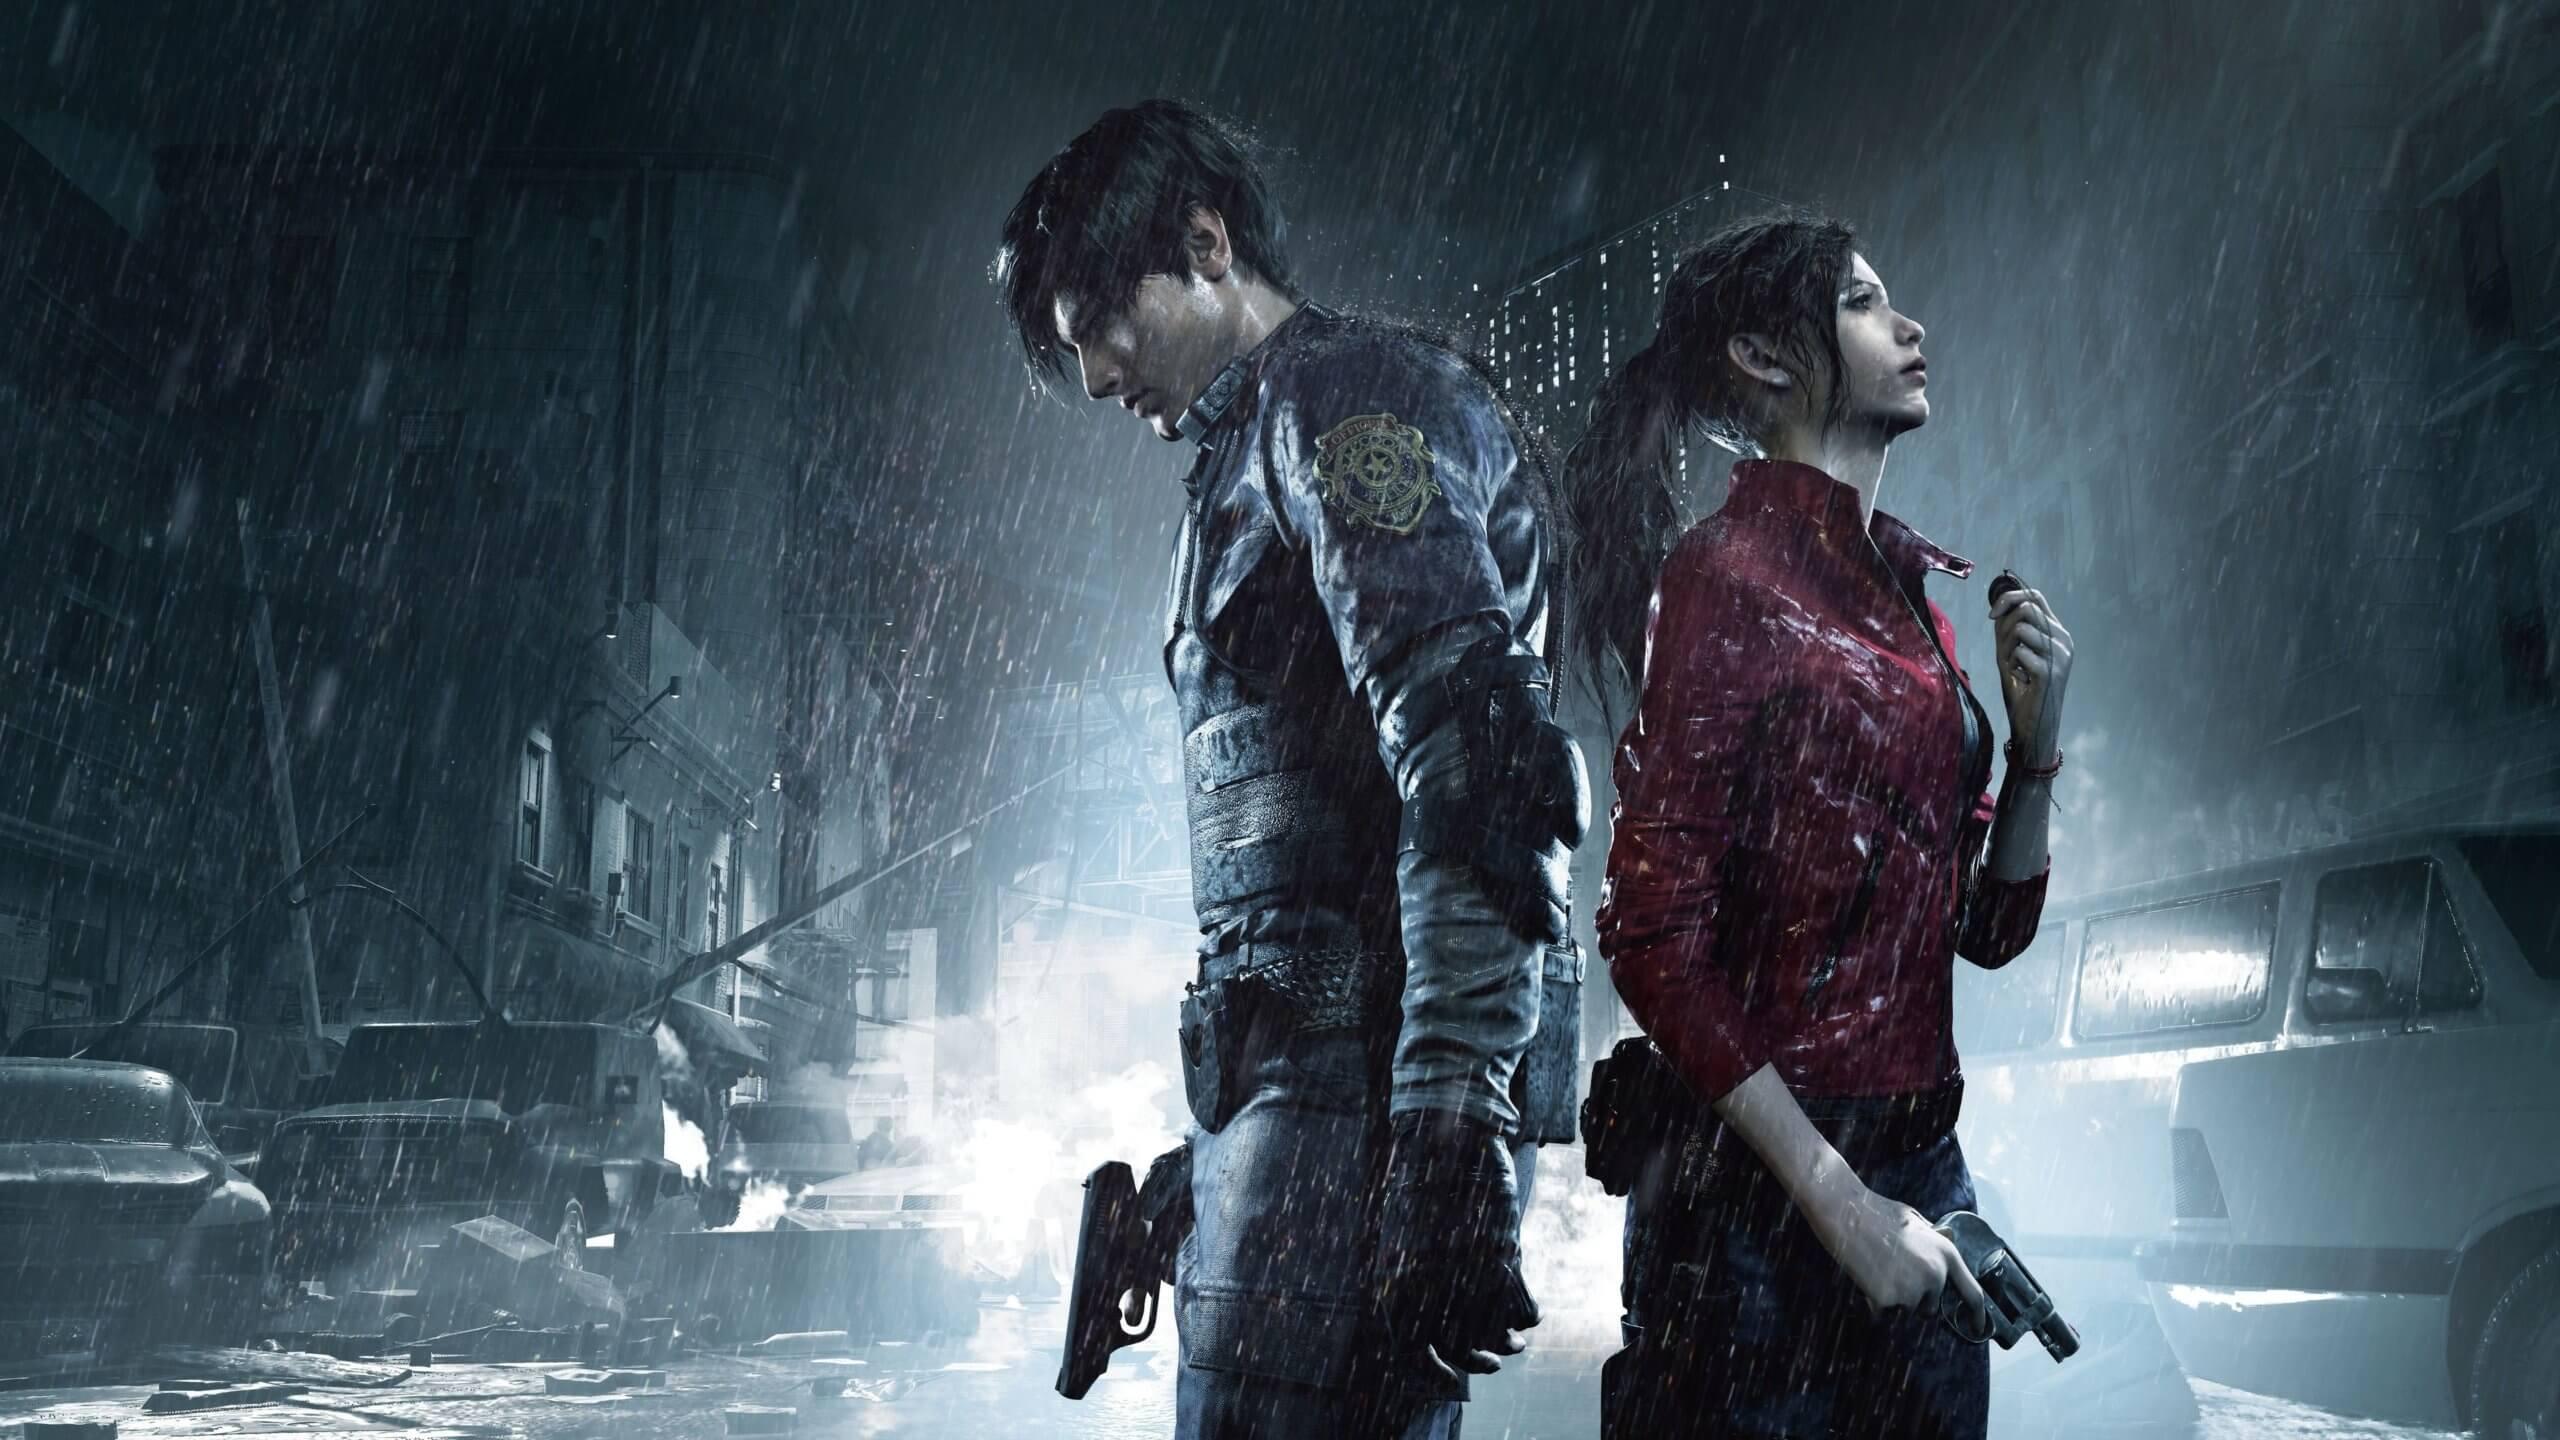 Se confirma la grabación de reshoots de Resident Evil: Welcome to Raccoon City